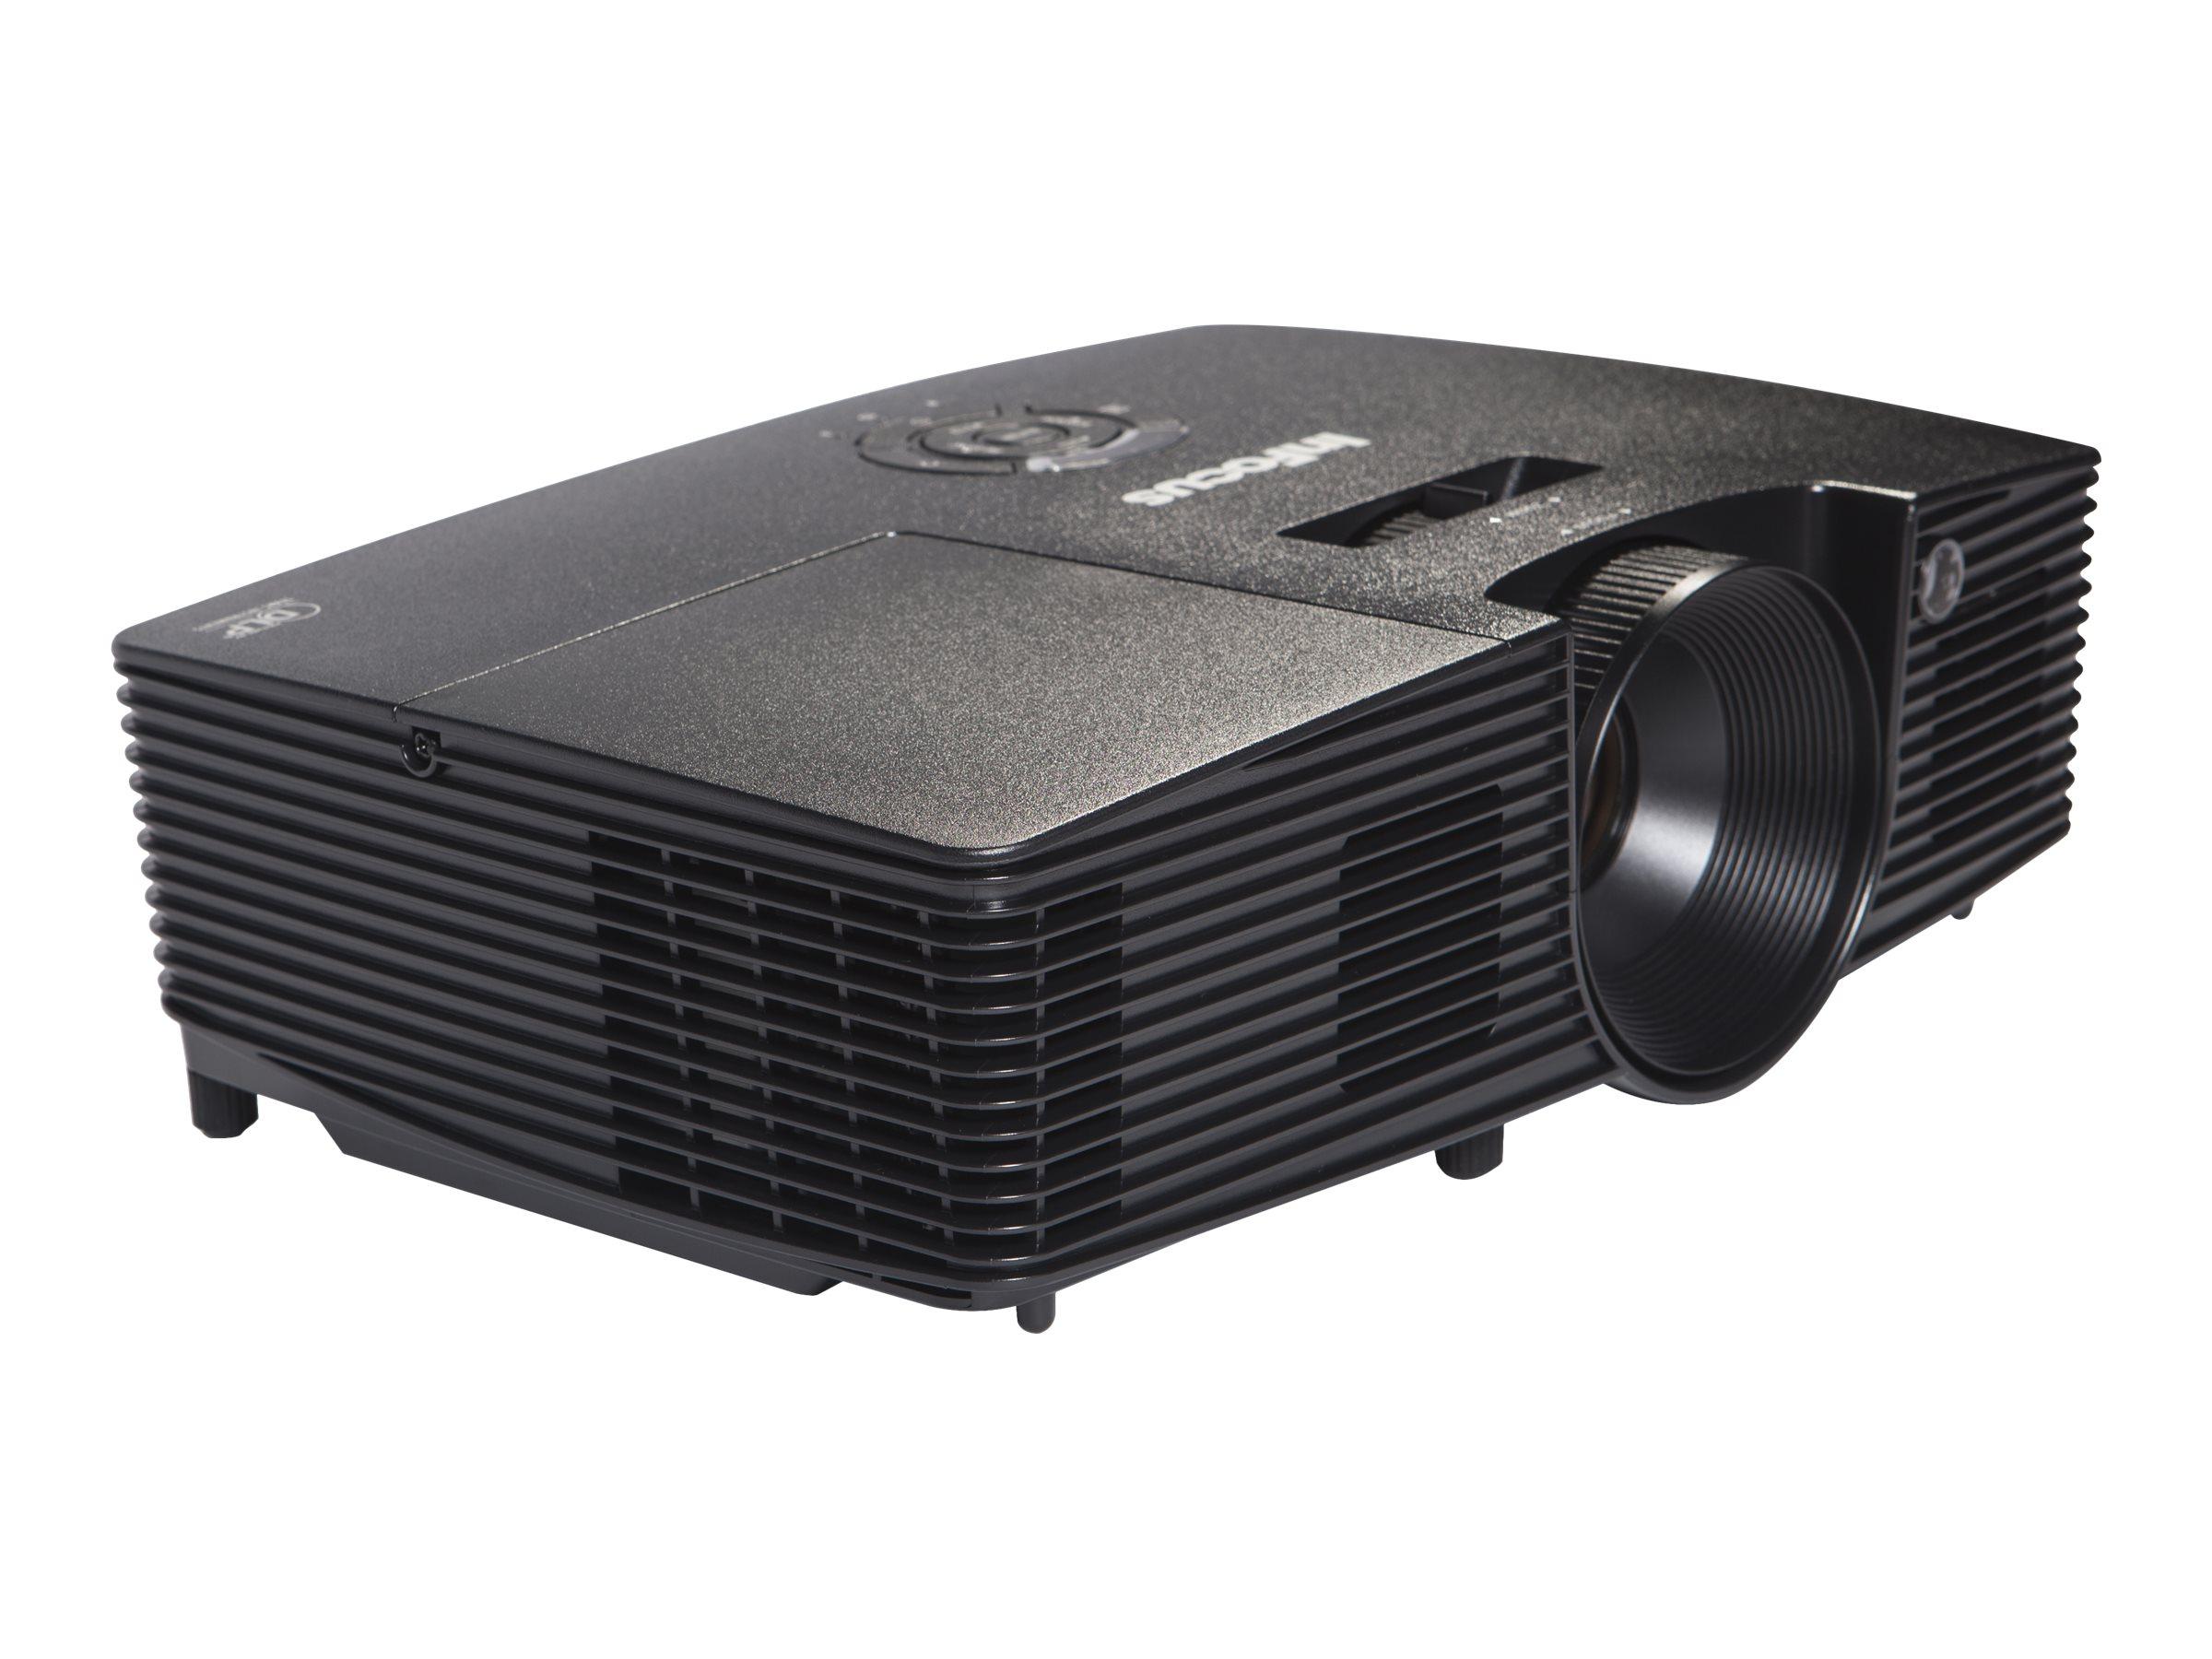 InFocus IN116xv - DLP projector - portable - 3D